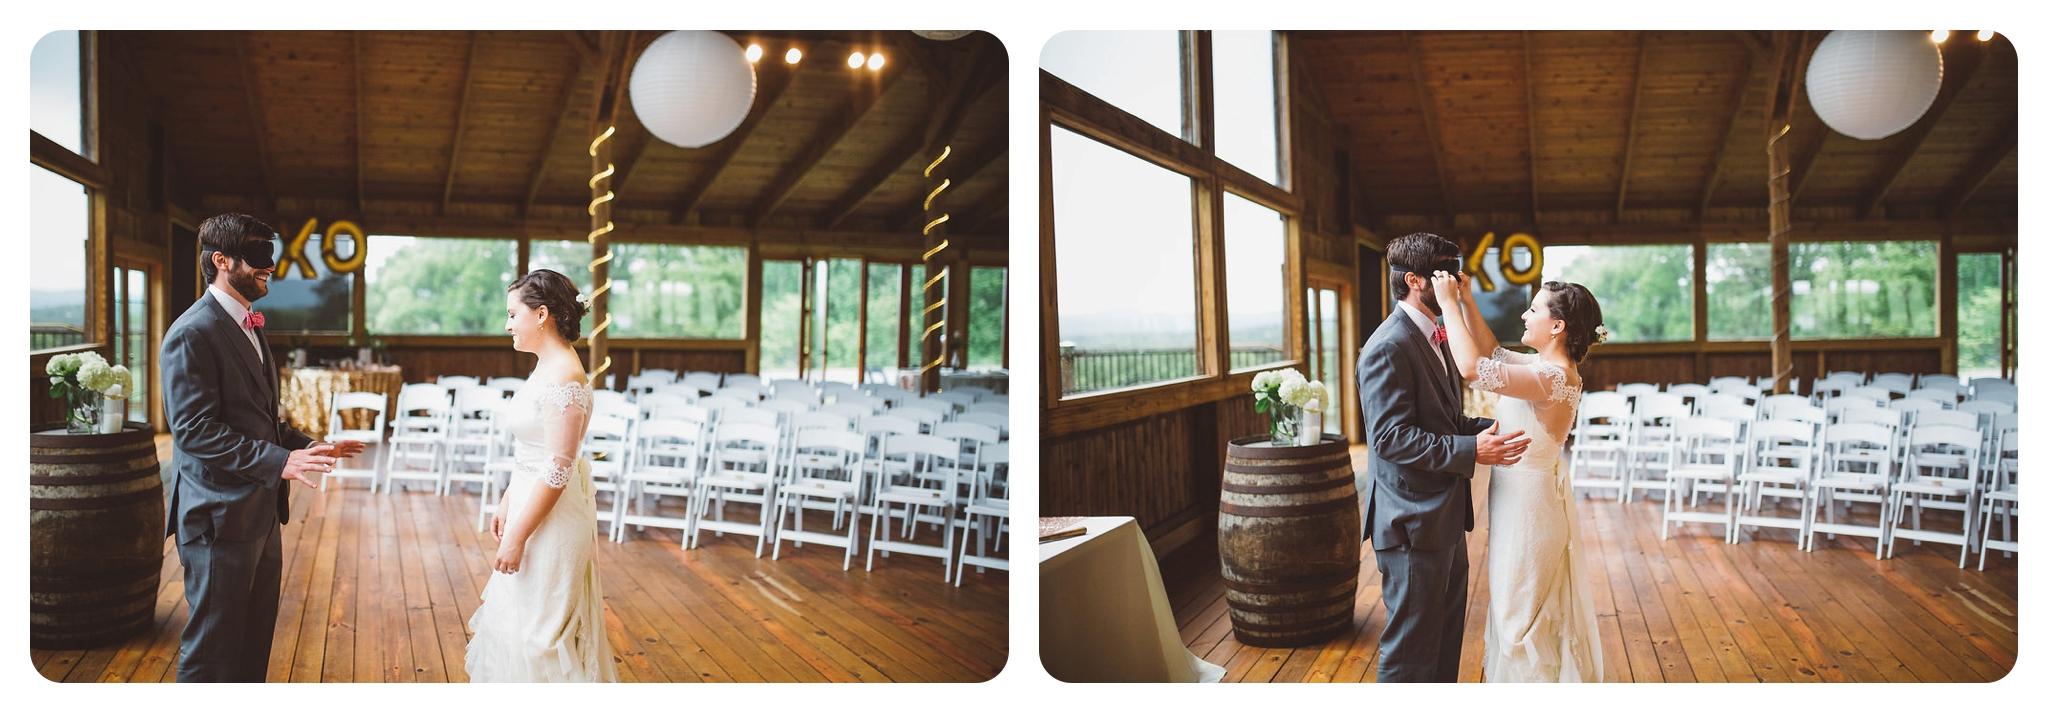 Braeloch-Weddings-Wedding-Photographer-Pat-Cori-Photography-011.jpg